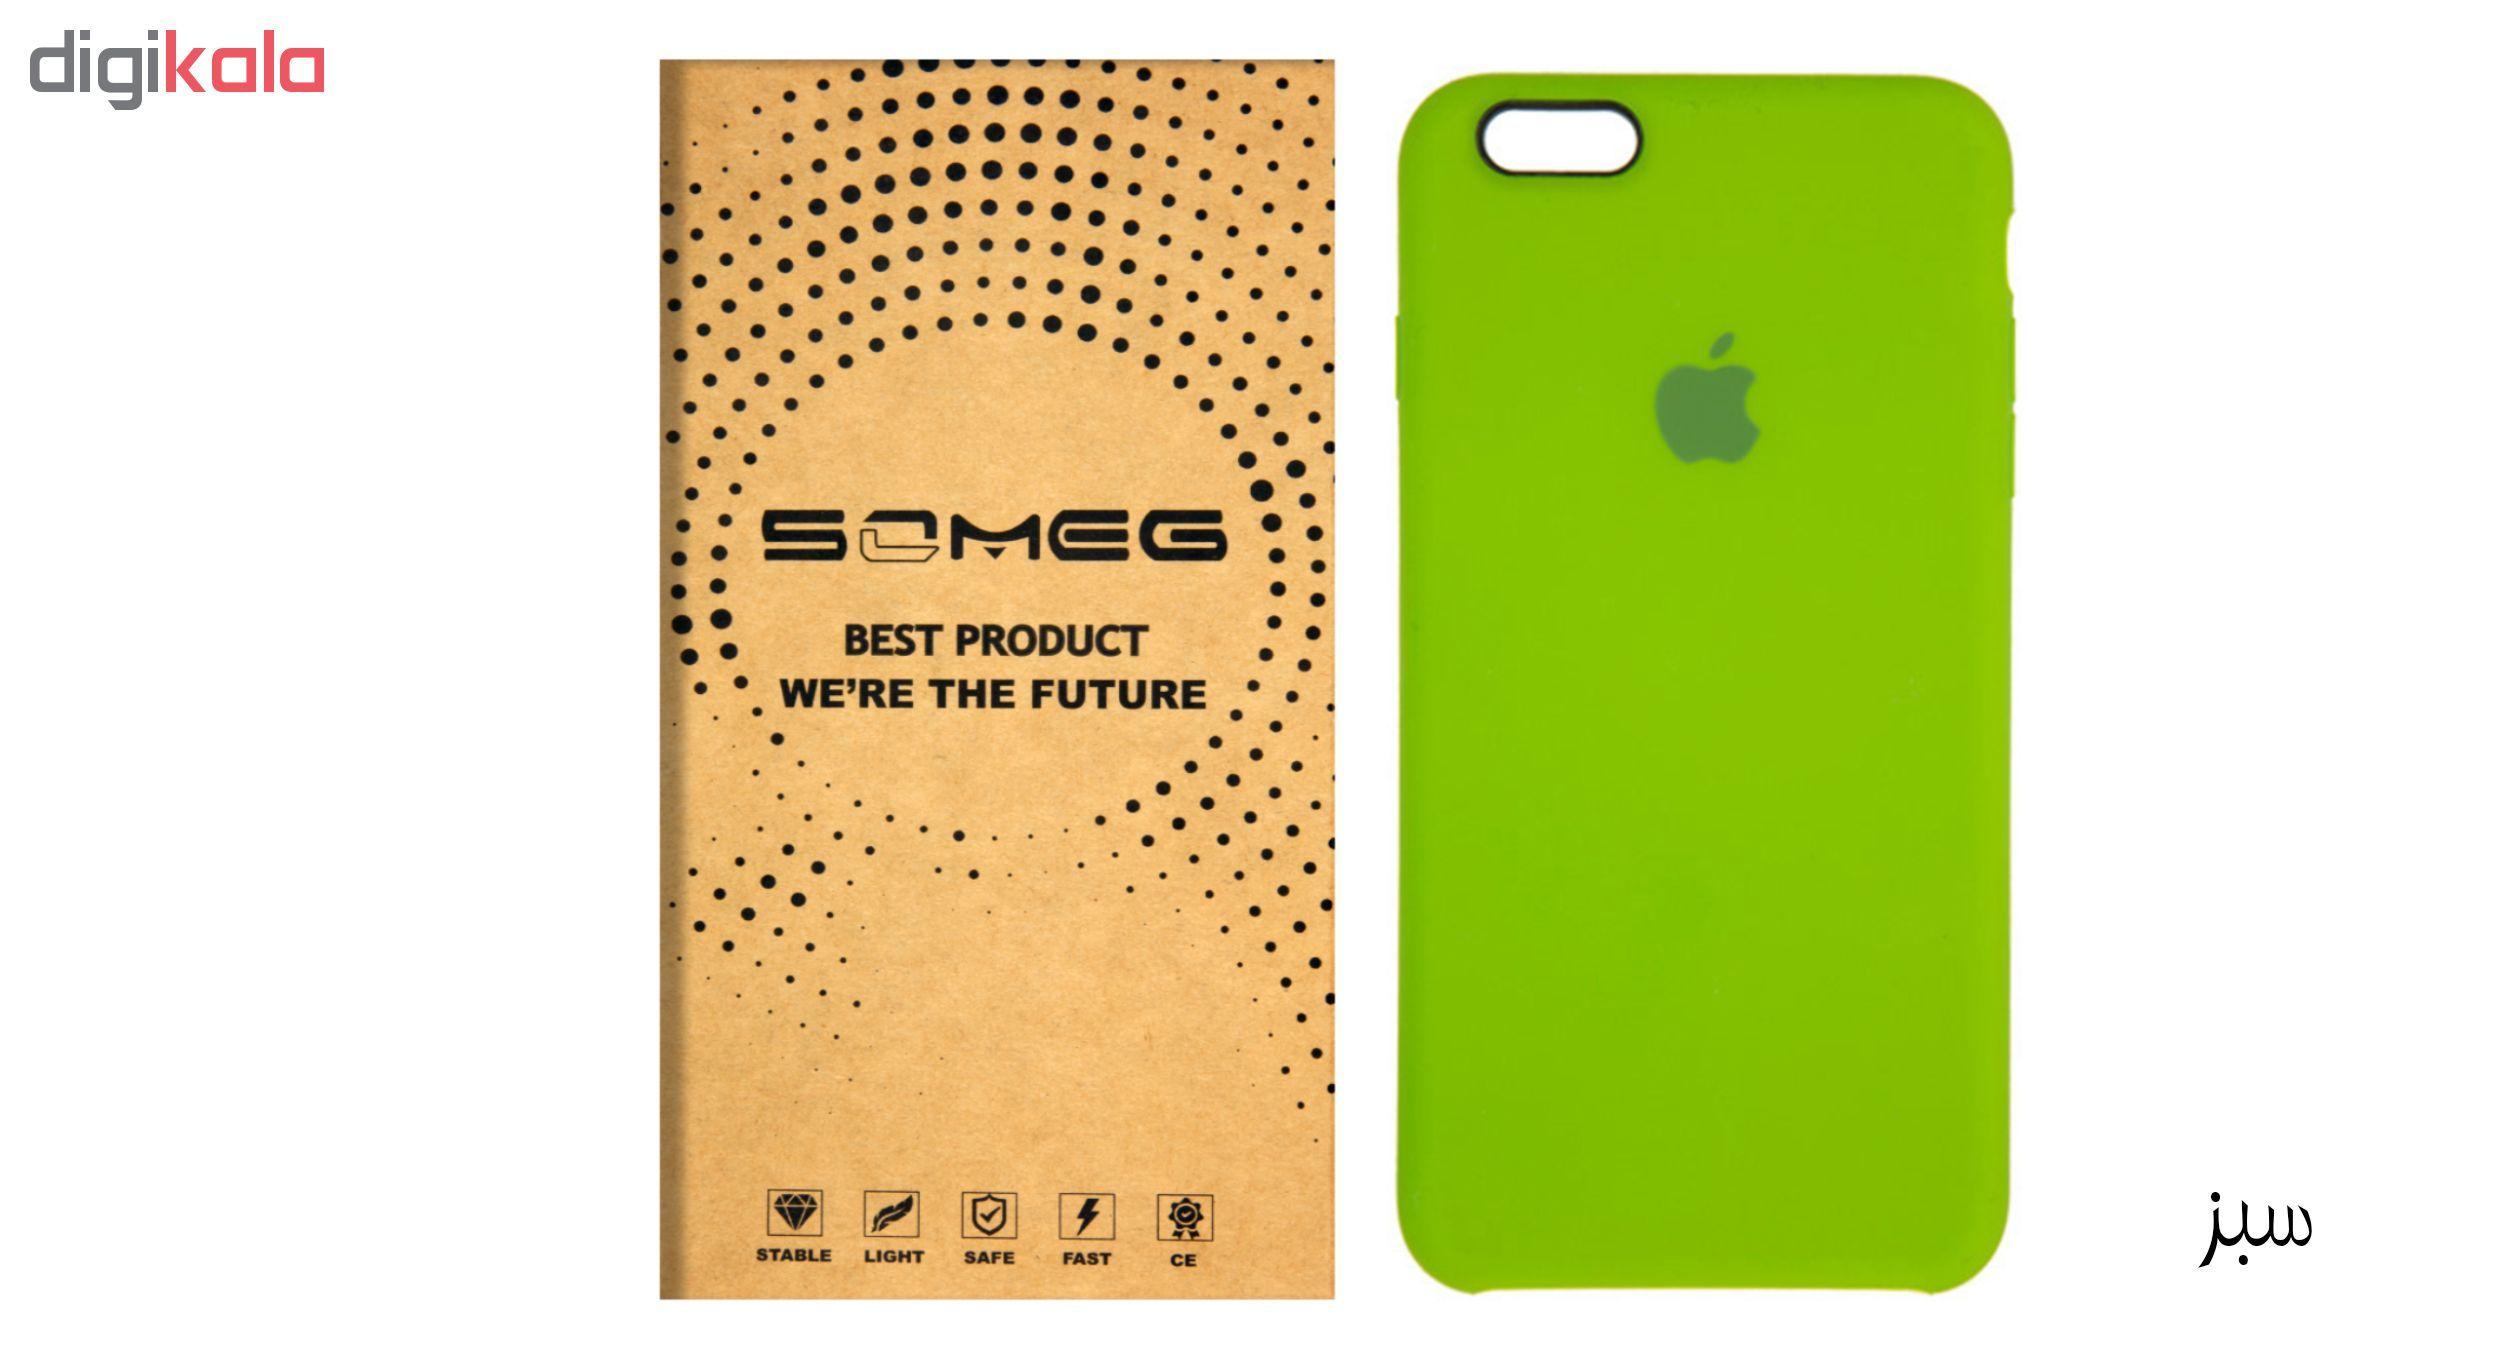 کاور سومگ مدل SIC مناسب برای گوشی موبایل اپل iPhone 6/6s main 1 8